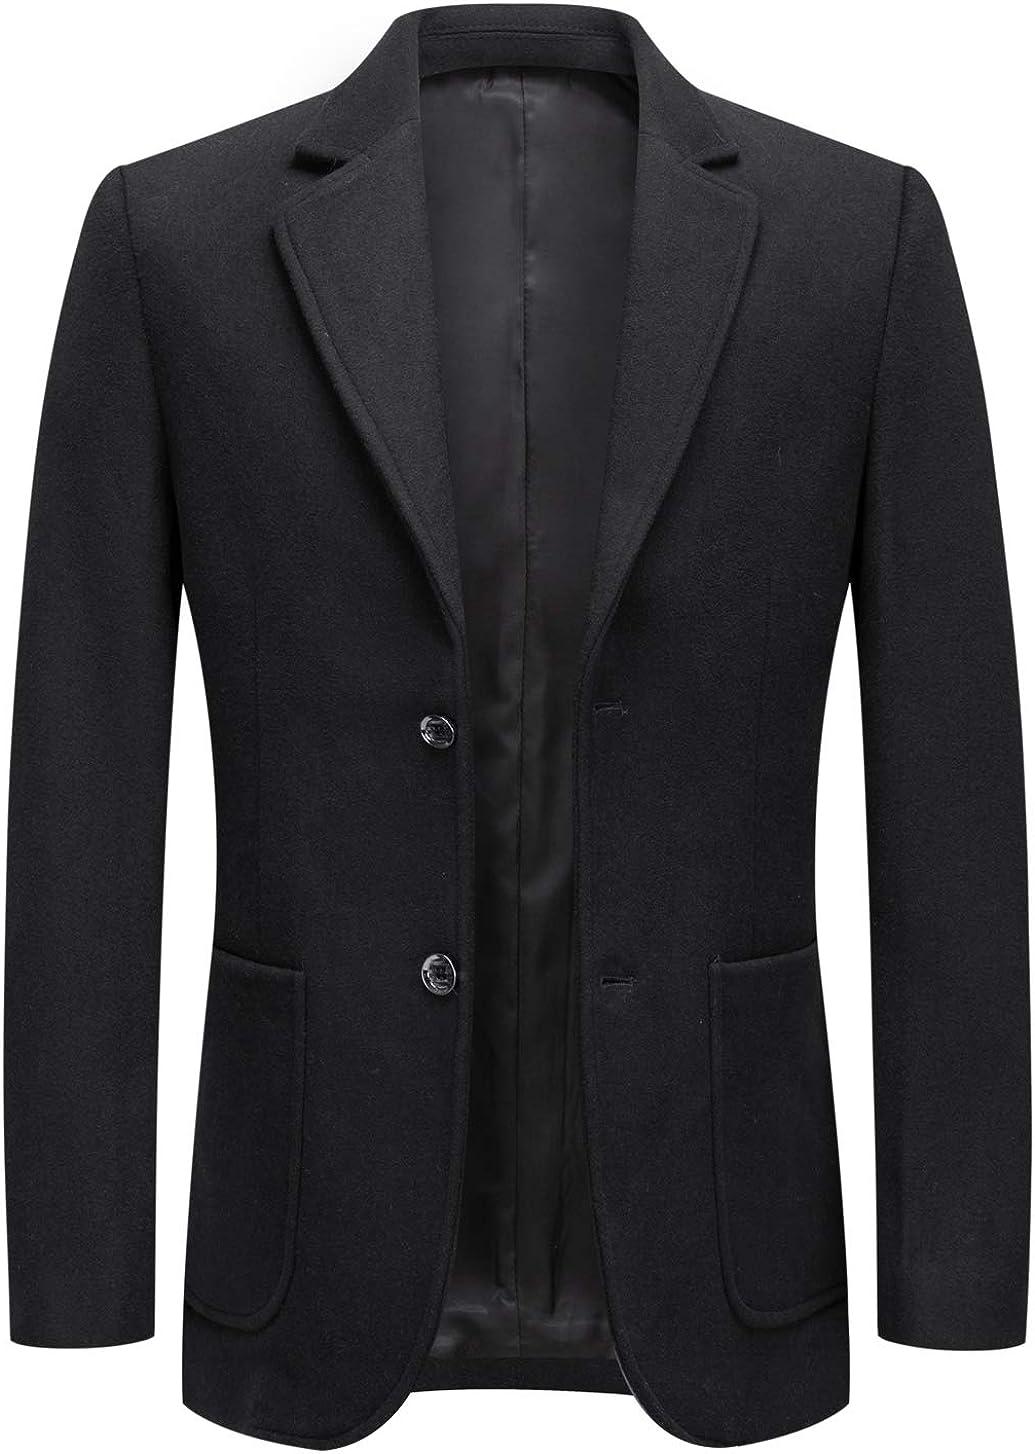 chouyatou Men's Gentle Notched Collar 2 Button Tailored Wool Blend Business Blazer Jacket Coat